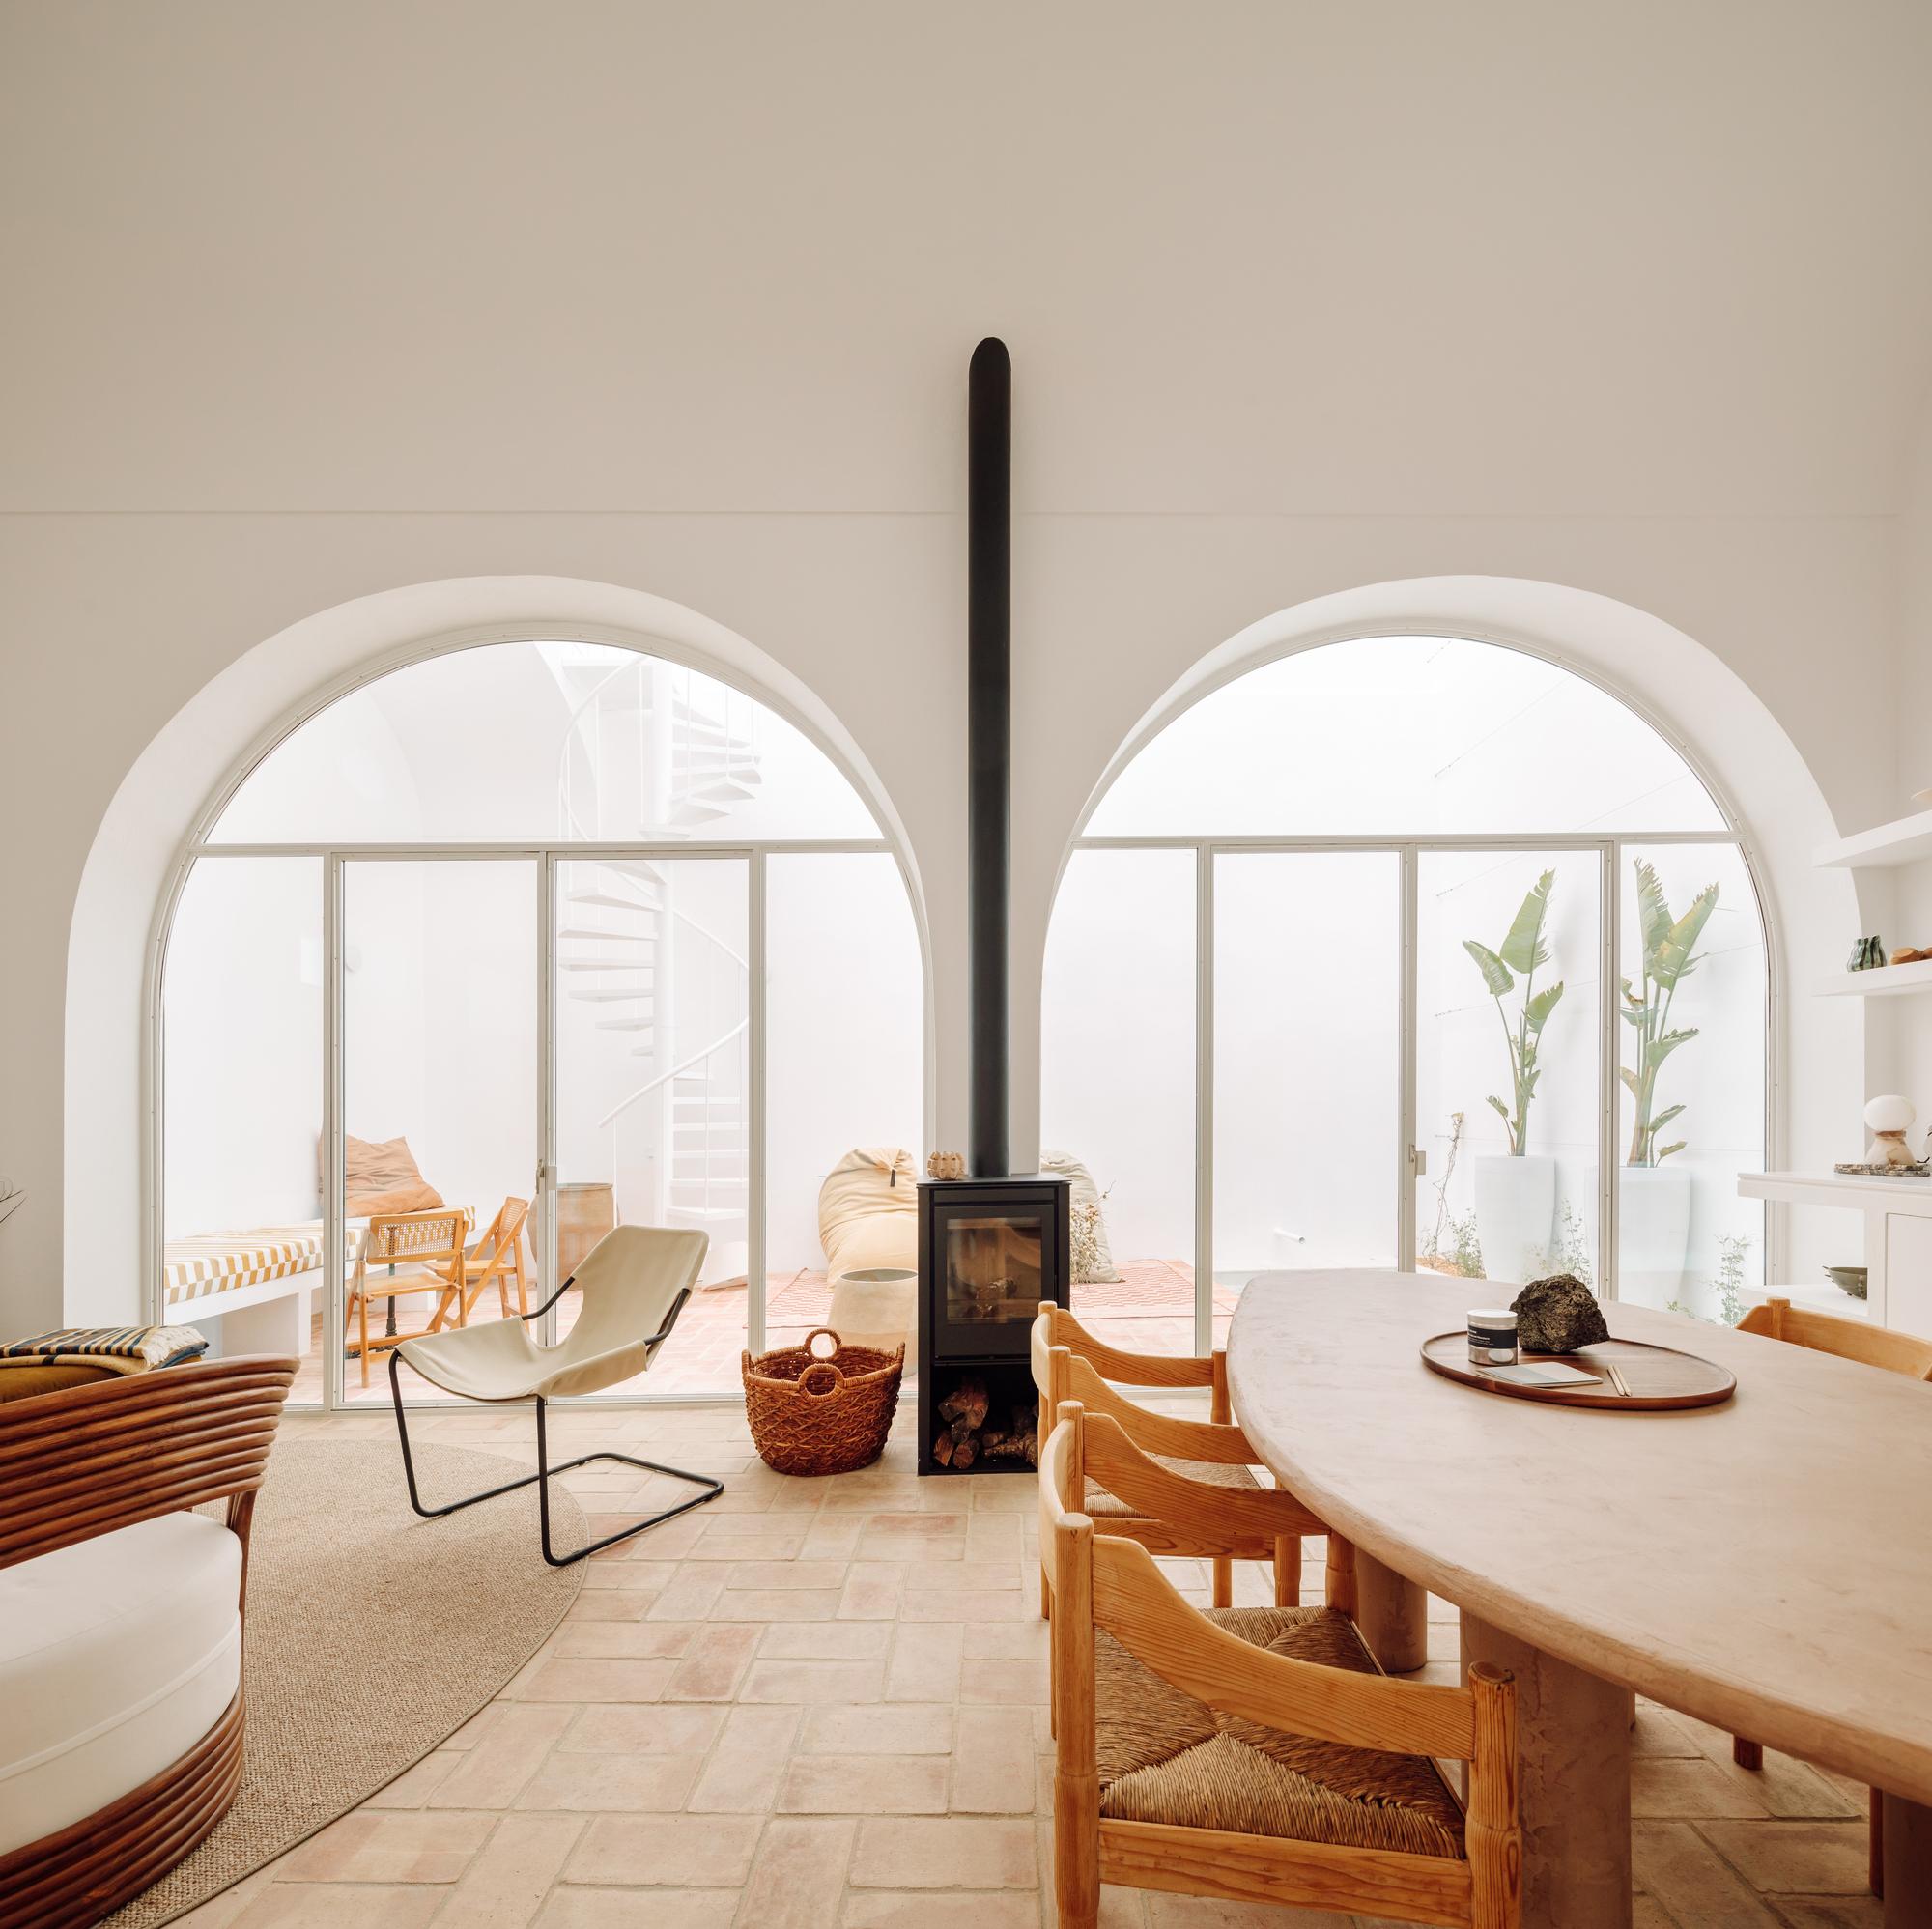 House Two / atelier RUA